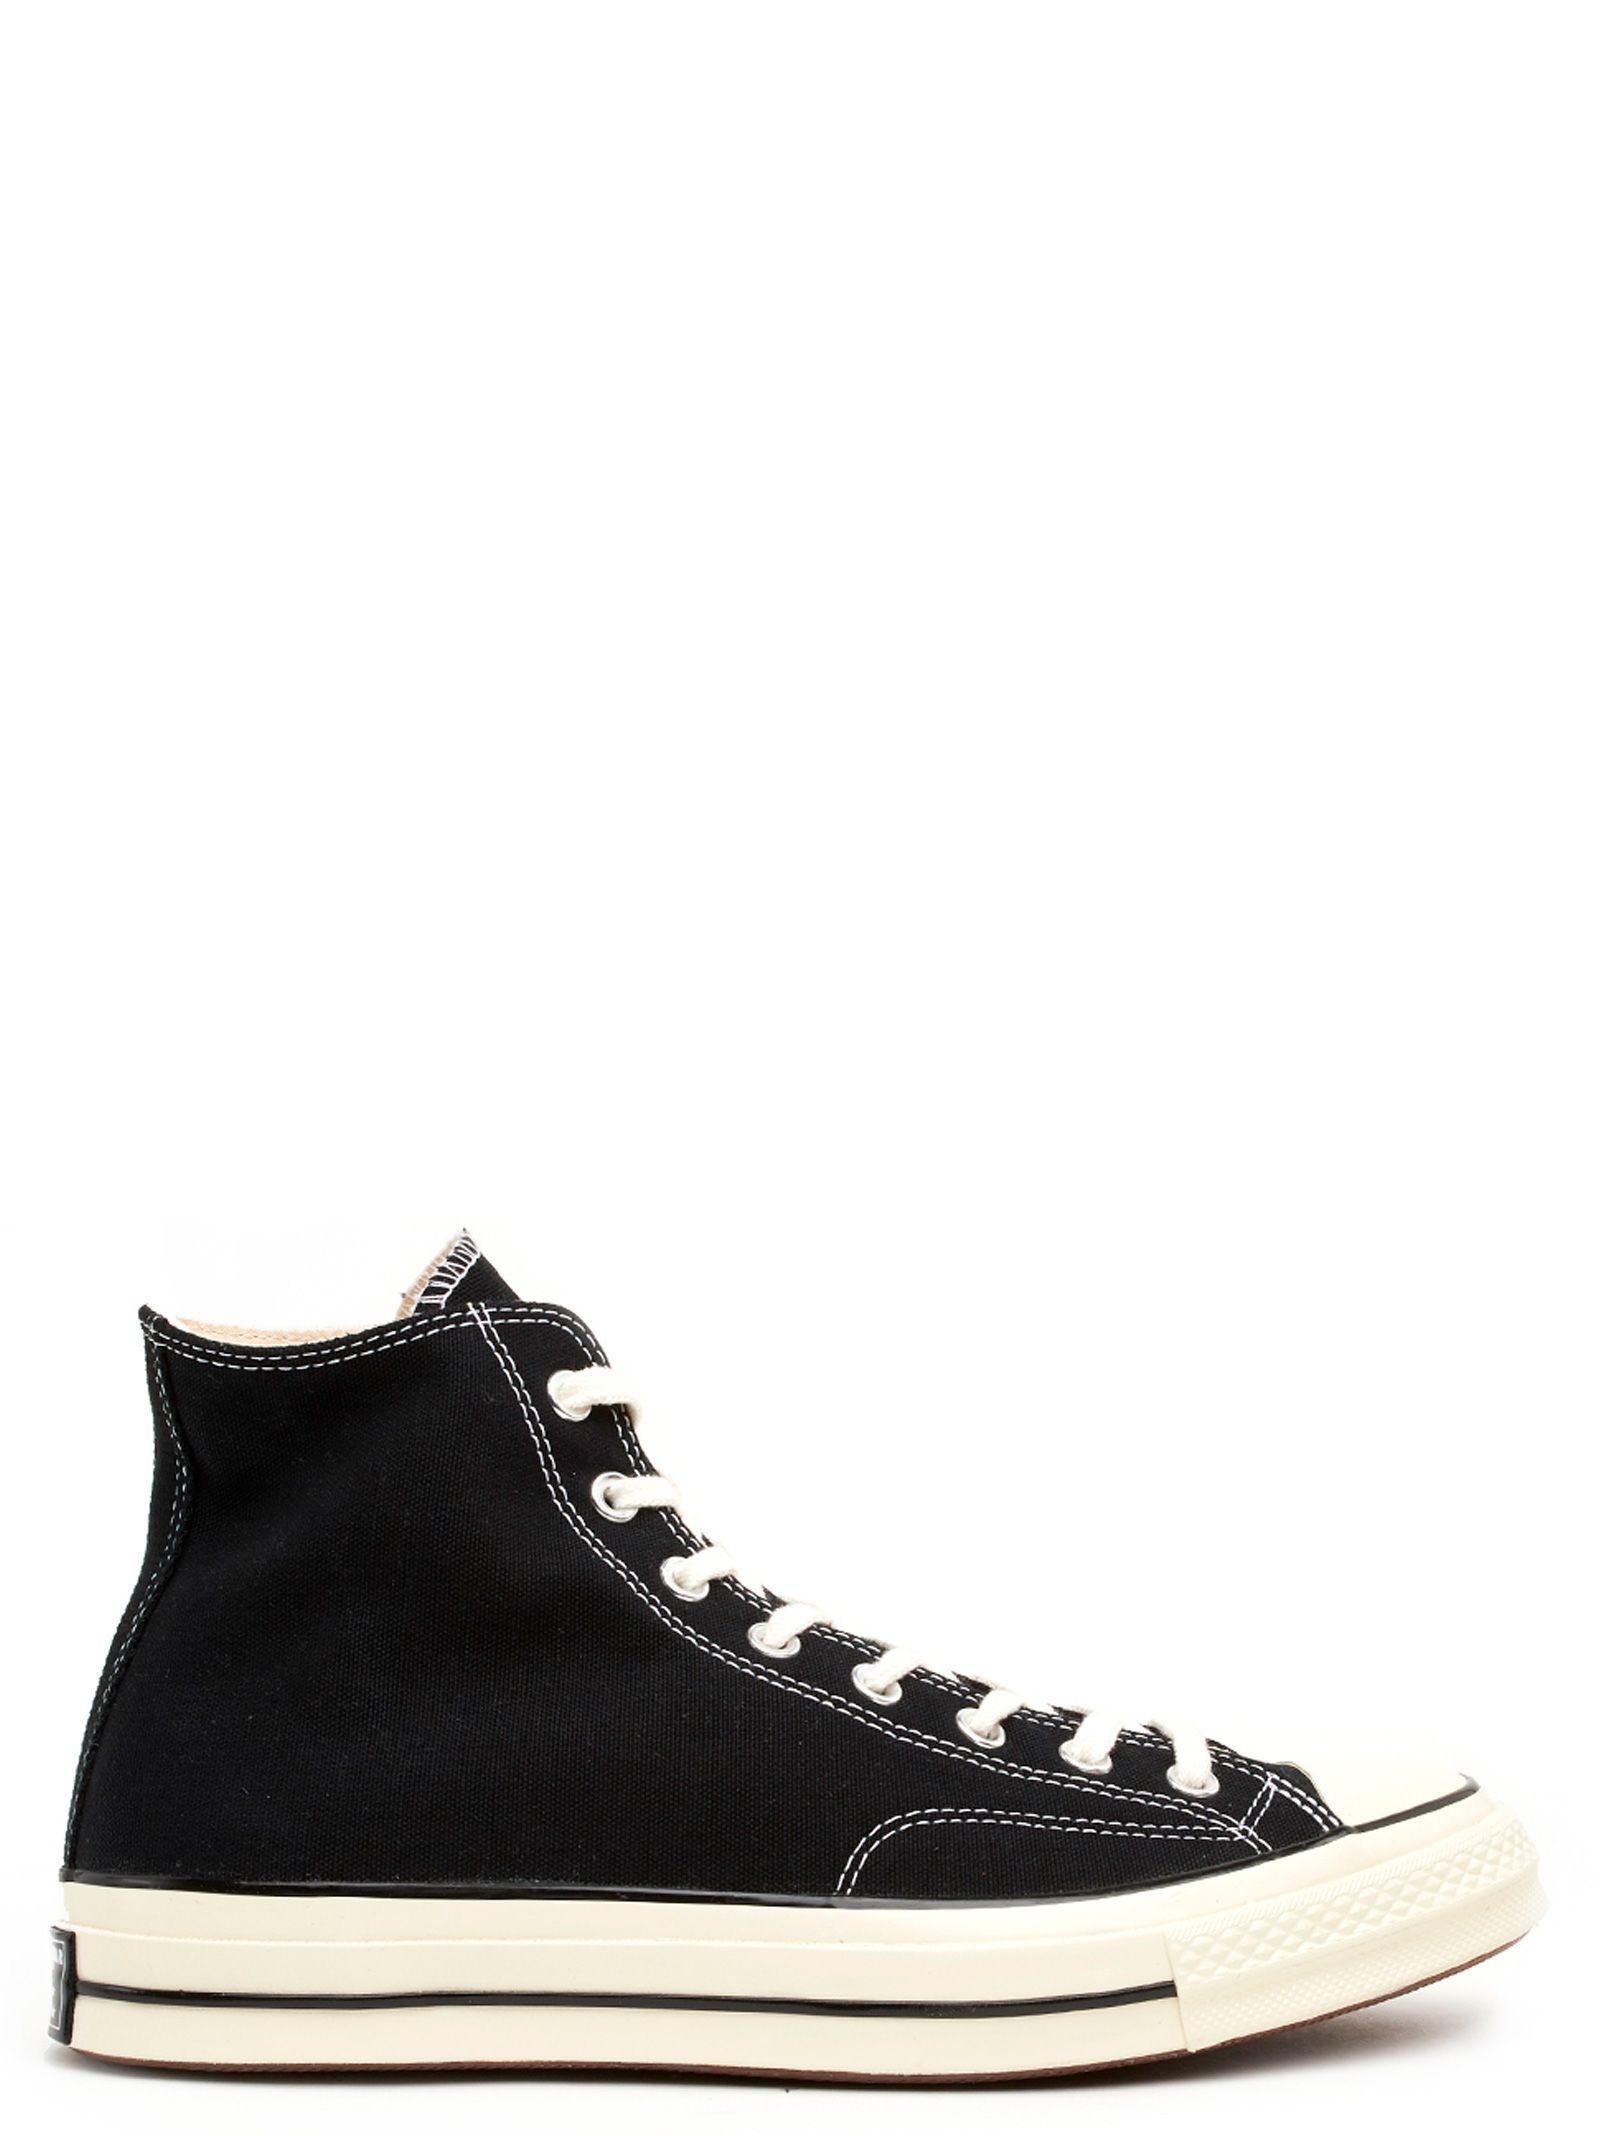 183cb9f4123 CONVERSE  CHUCK TAYLOR 1970S  SHOES.  converse  shoes